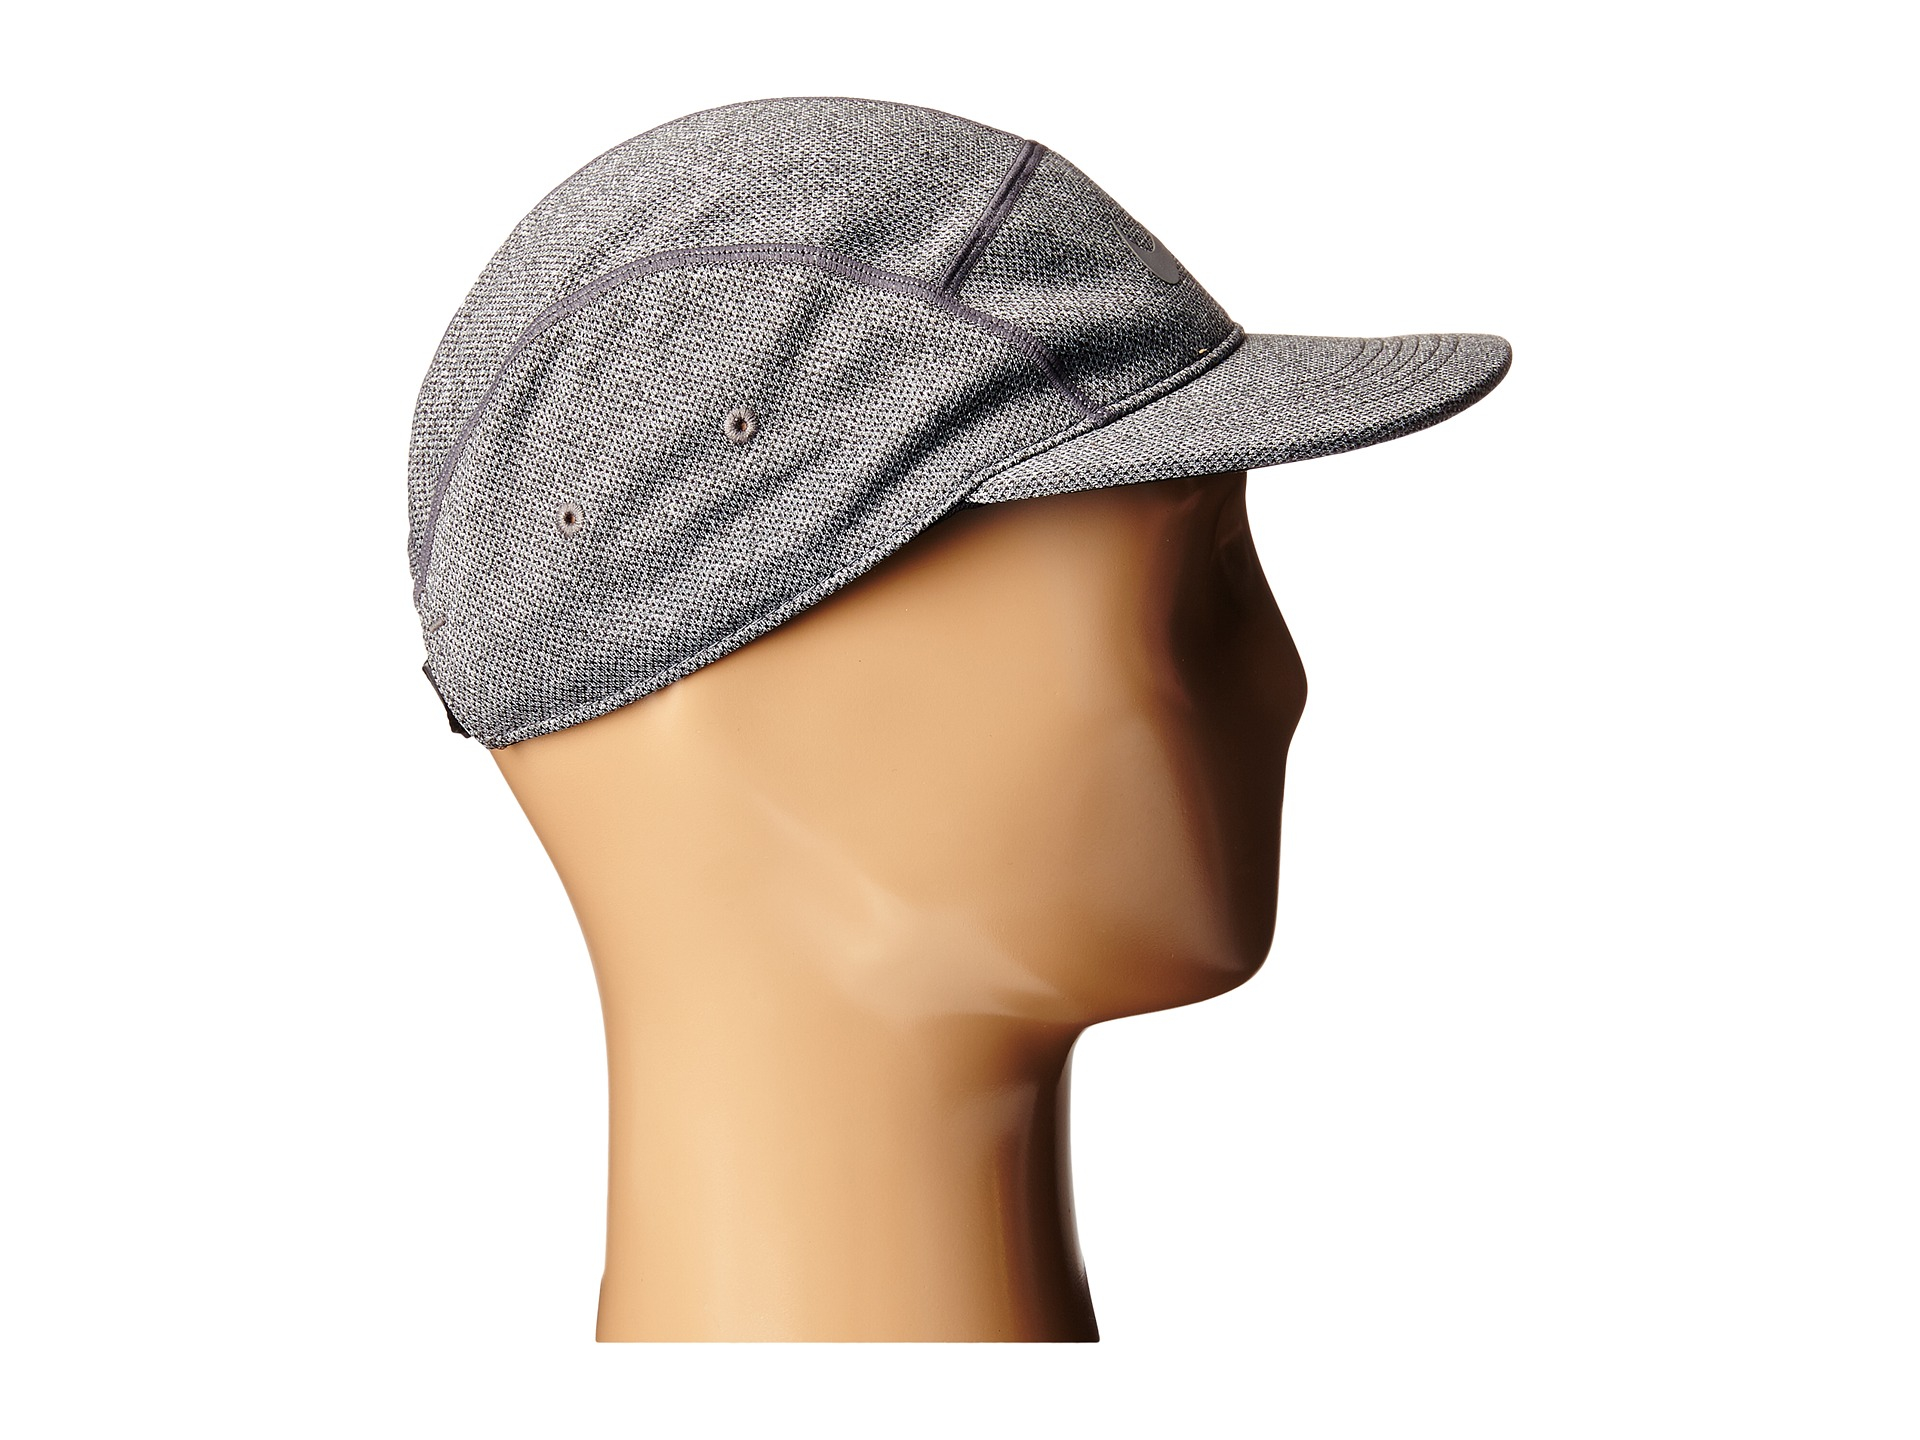 86dd9287578 ... unisex 5 panel running cap hat 909333 010 new 64998 b248a discount lyst nike  run dri fit knit aw84 hat in metallic for men 8ec23 d0210 ...